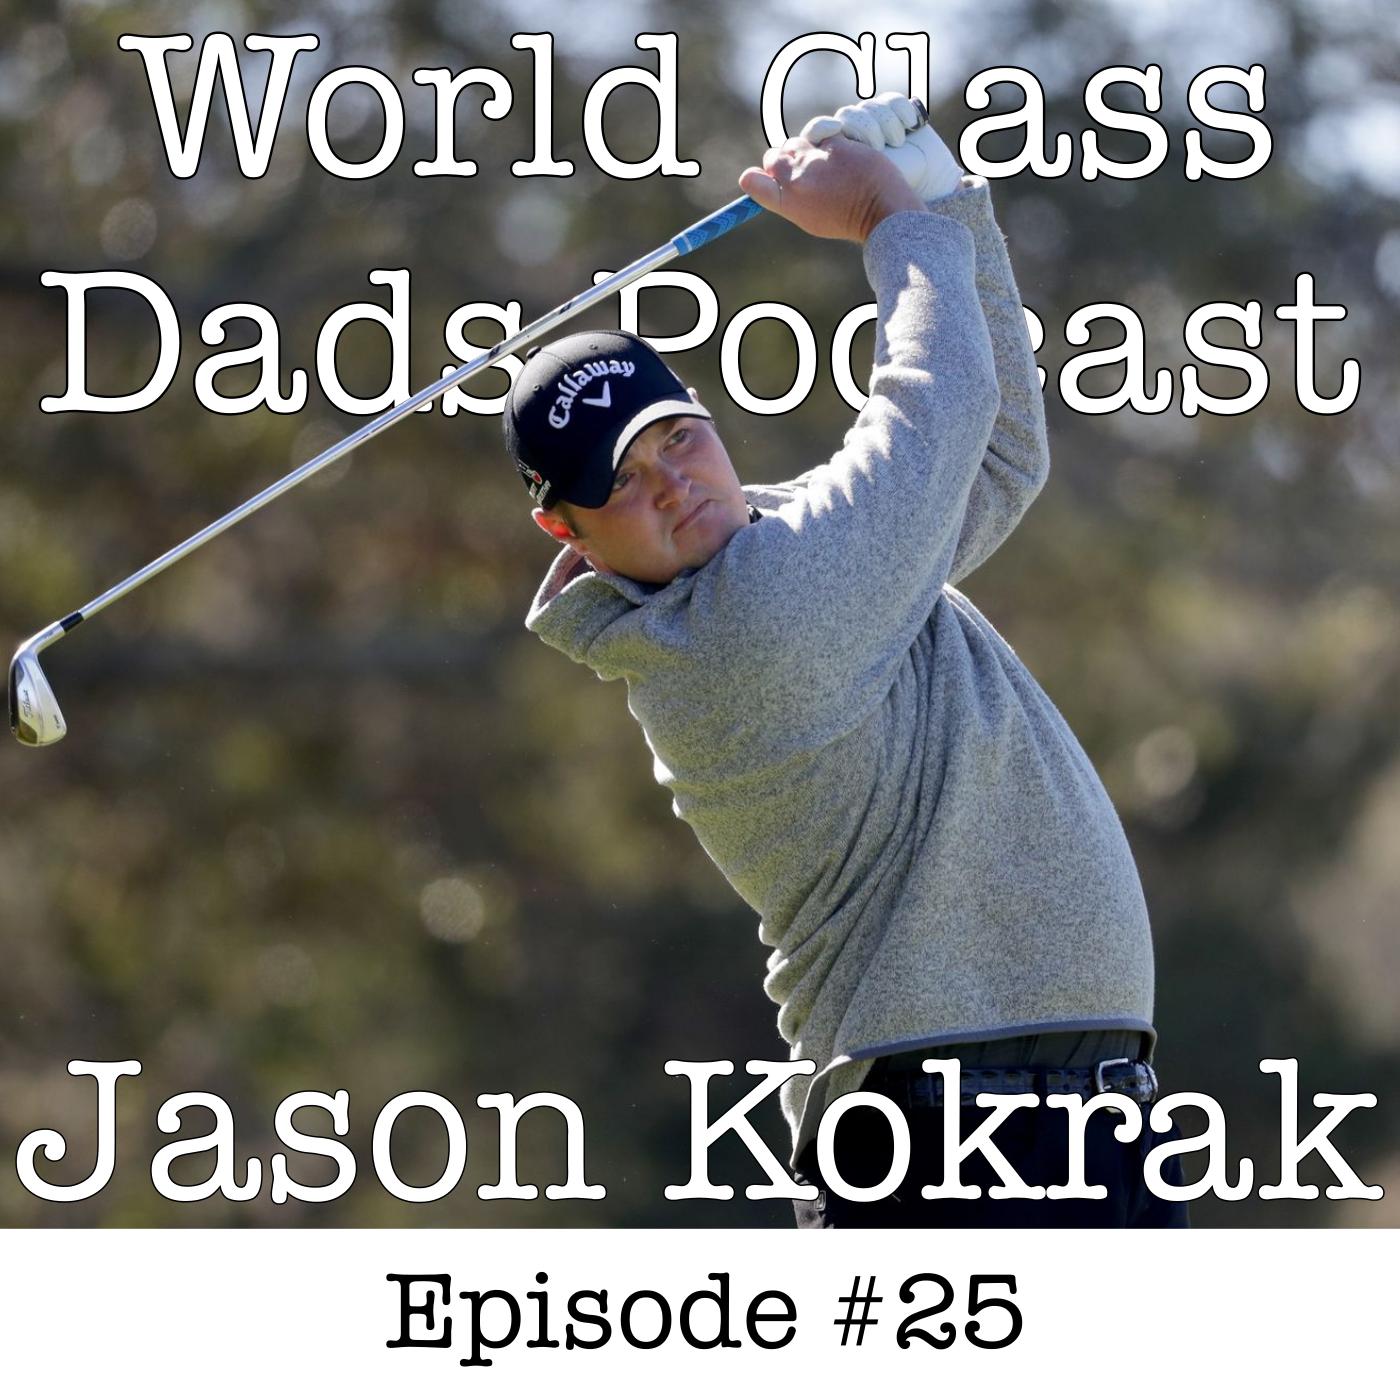 JASON KOKRAK - Fatherhood Insights from a PGA Champion